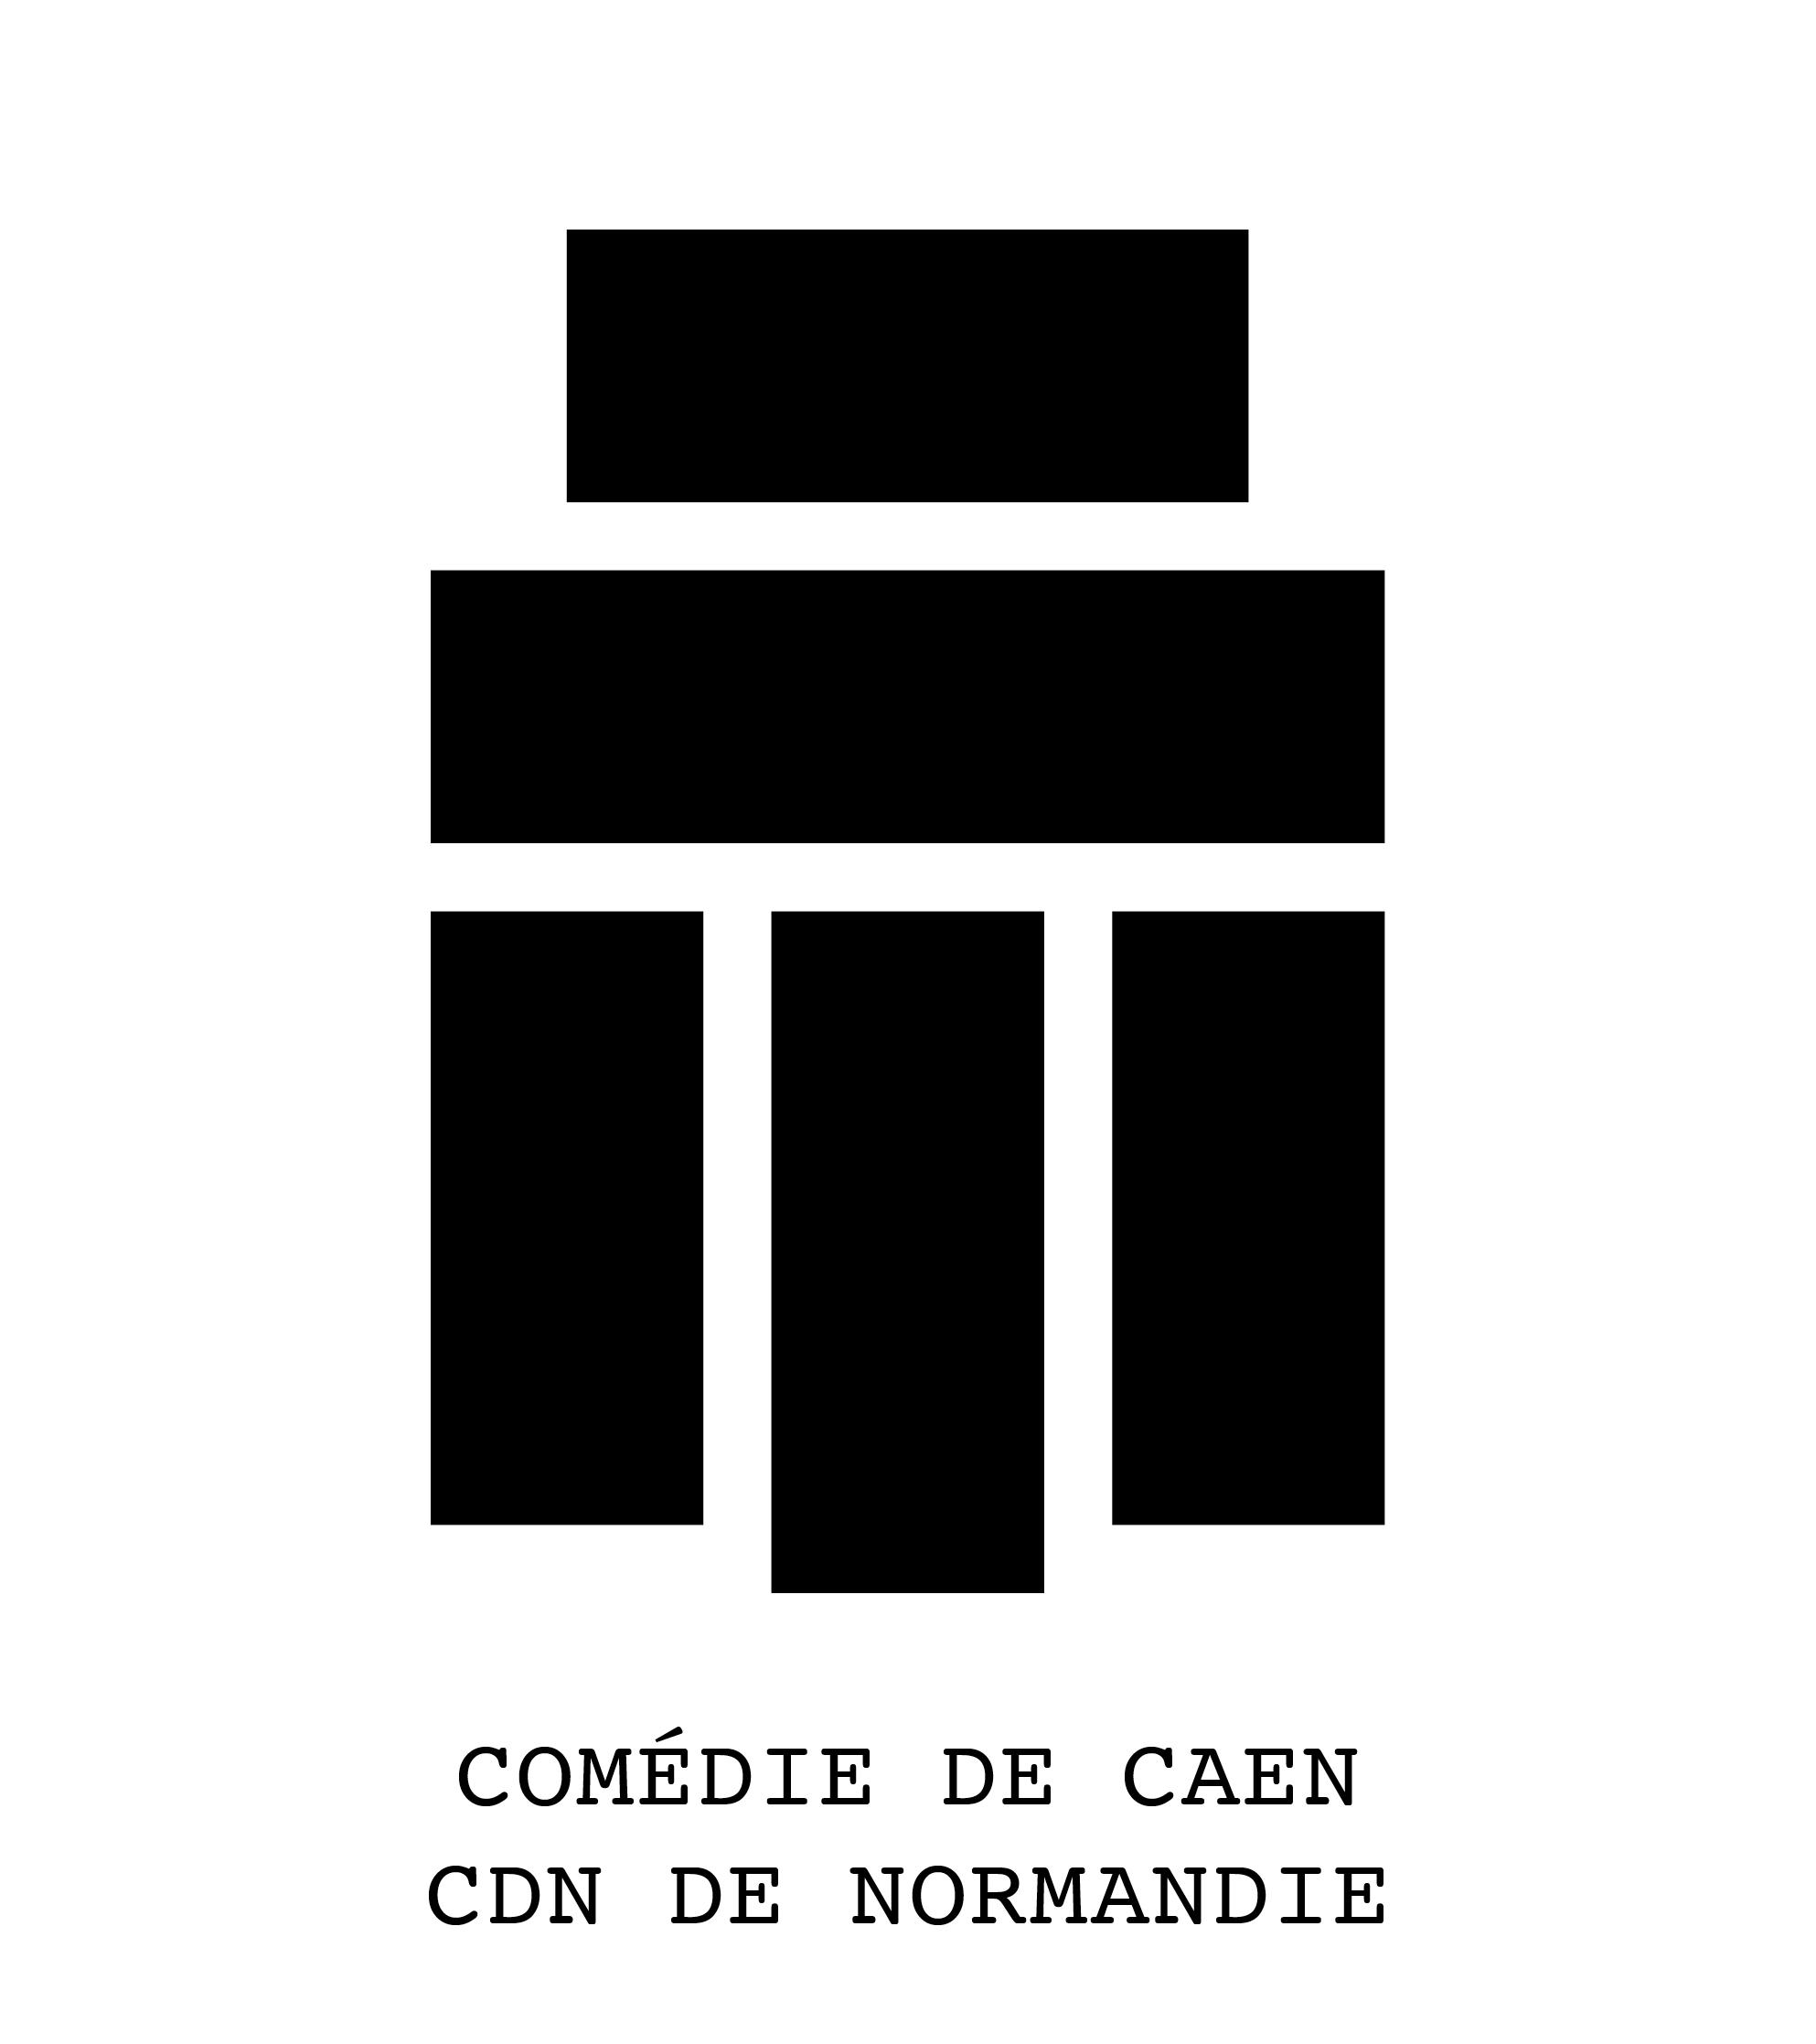 Comédie de Caen - CDN de Normandie